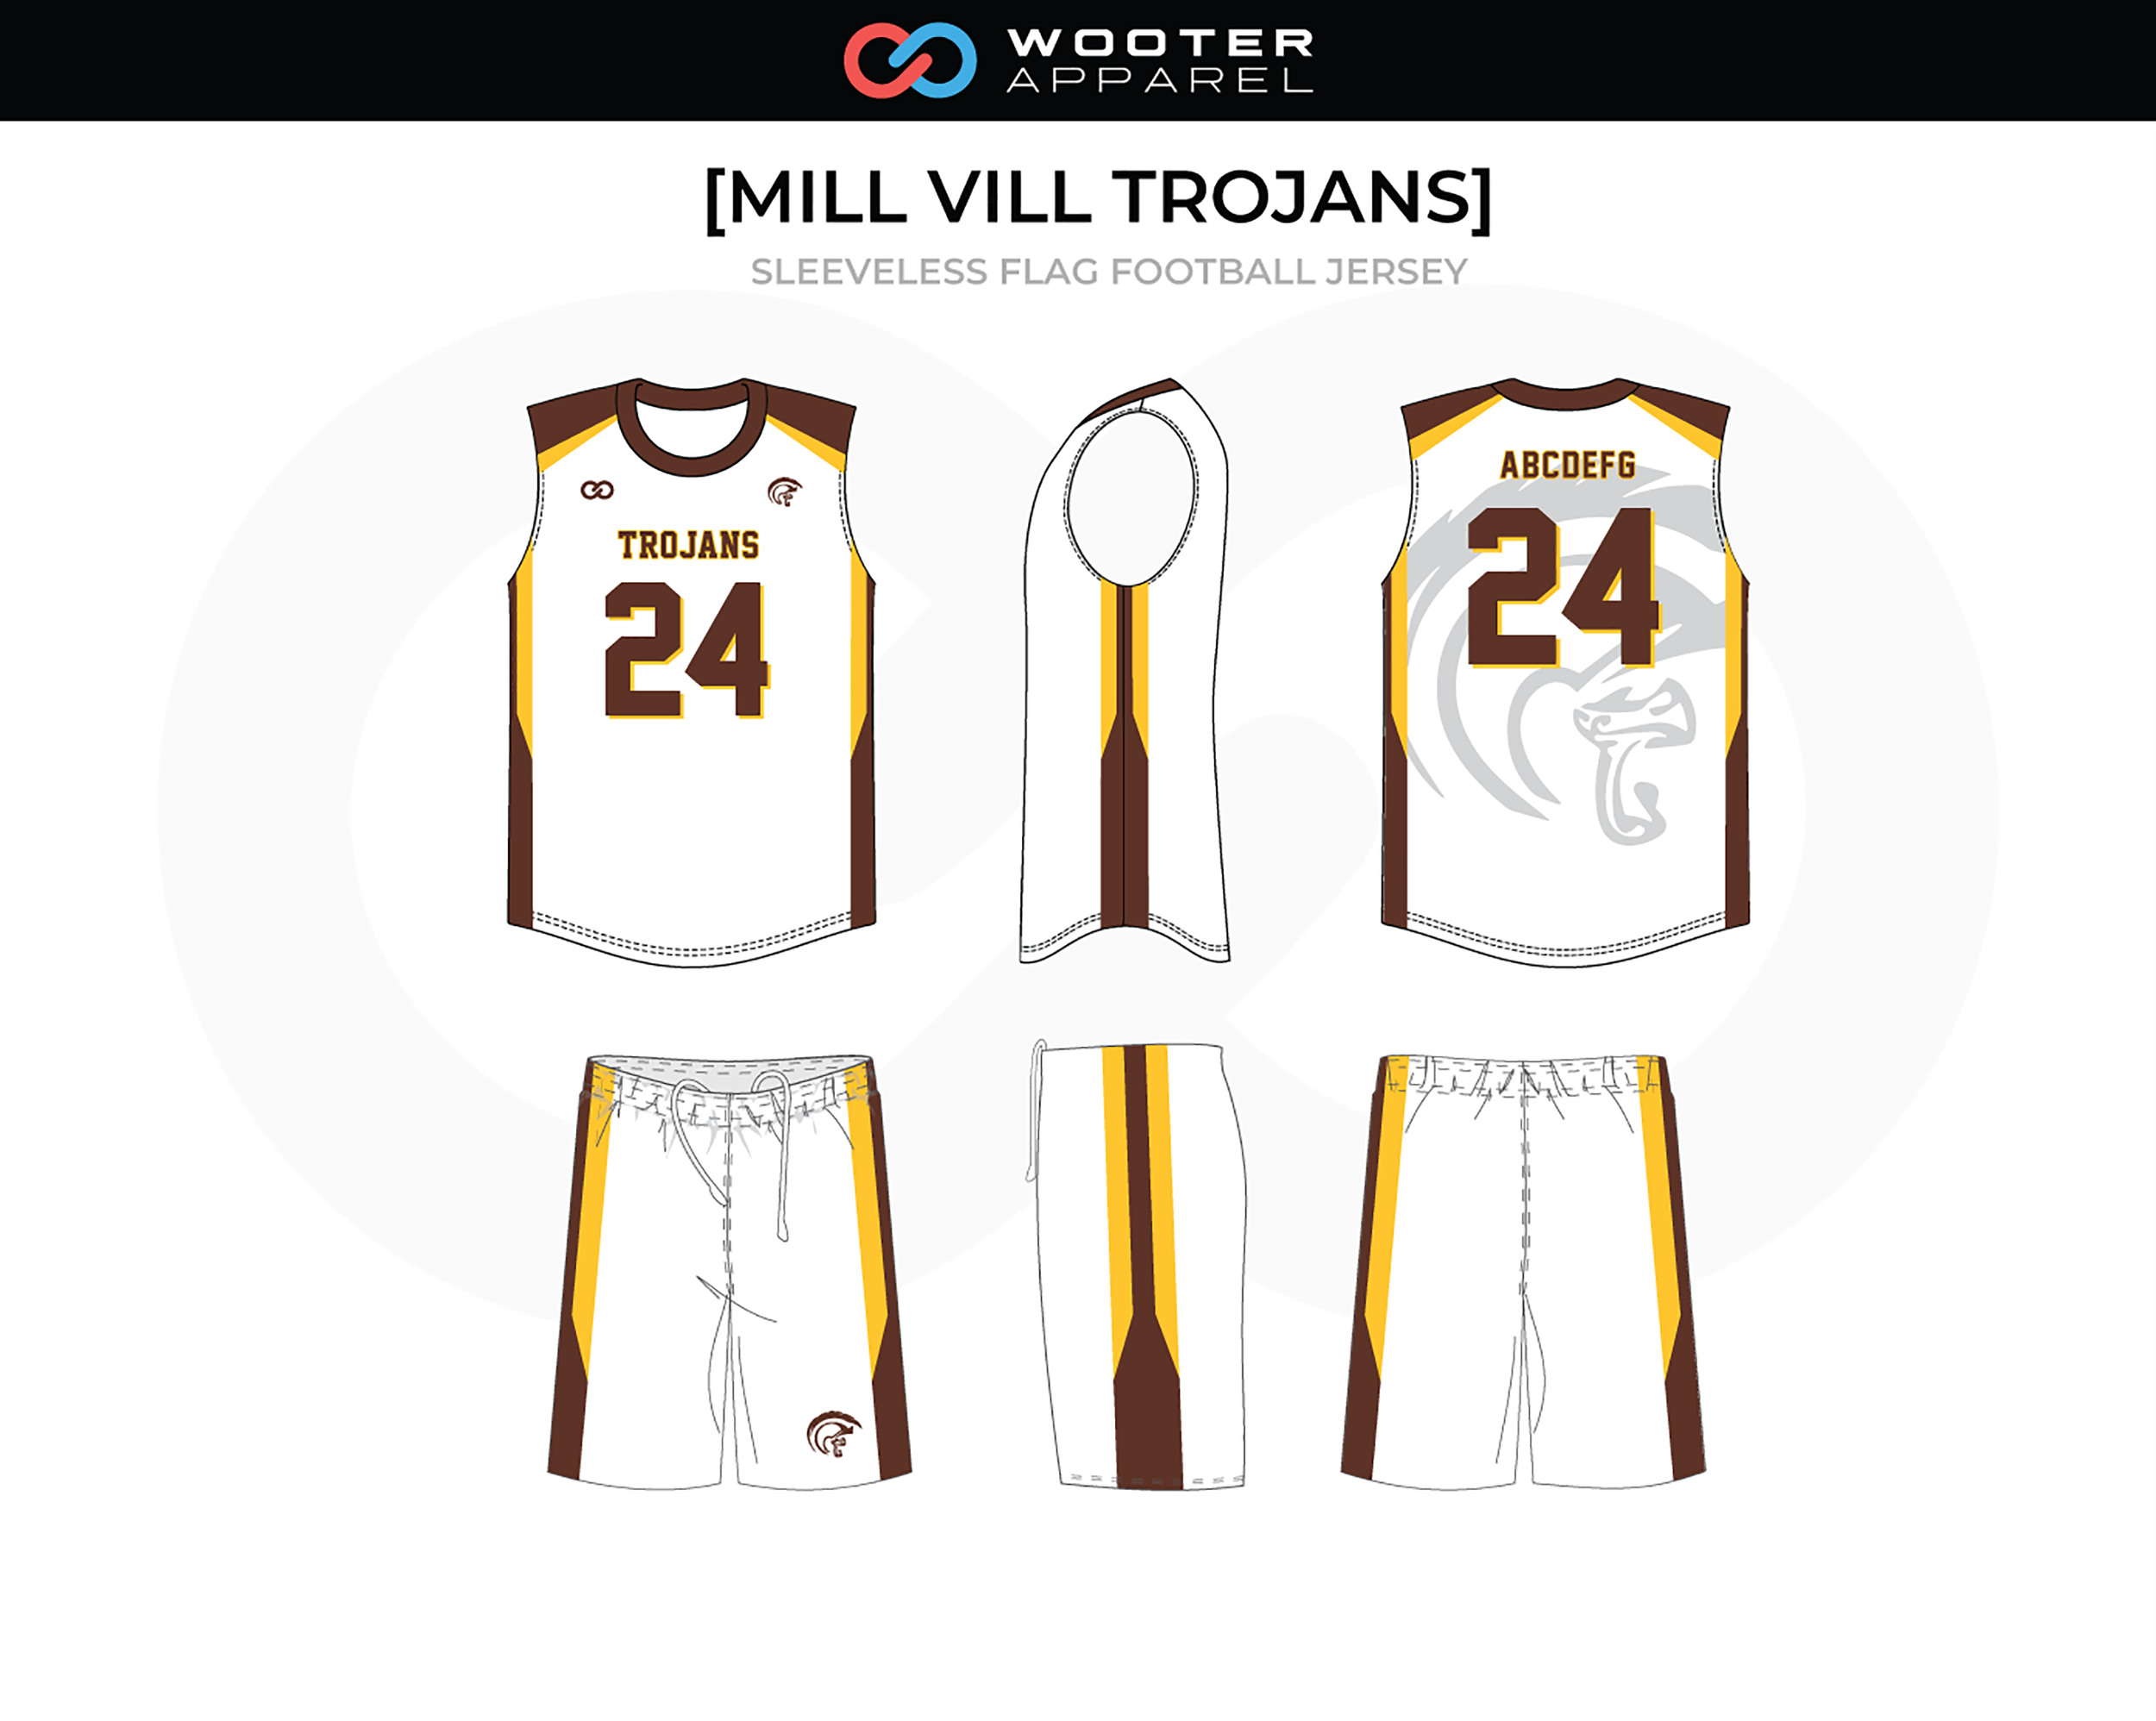 Mill-Vill-Trojans-Sleeveless-Flag-Football-Jersey_2018.png